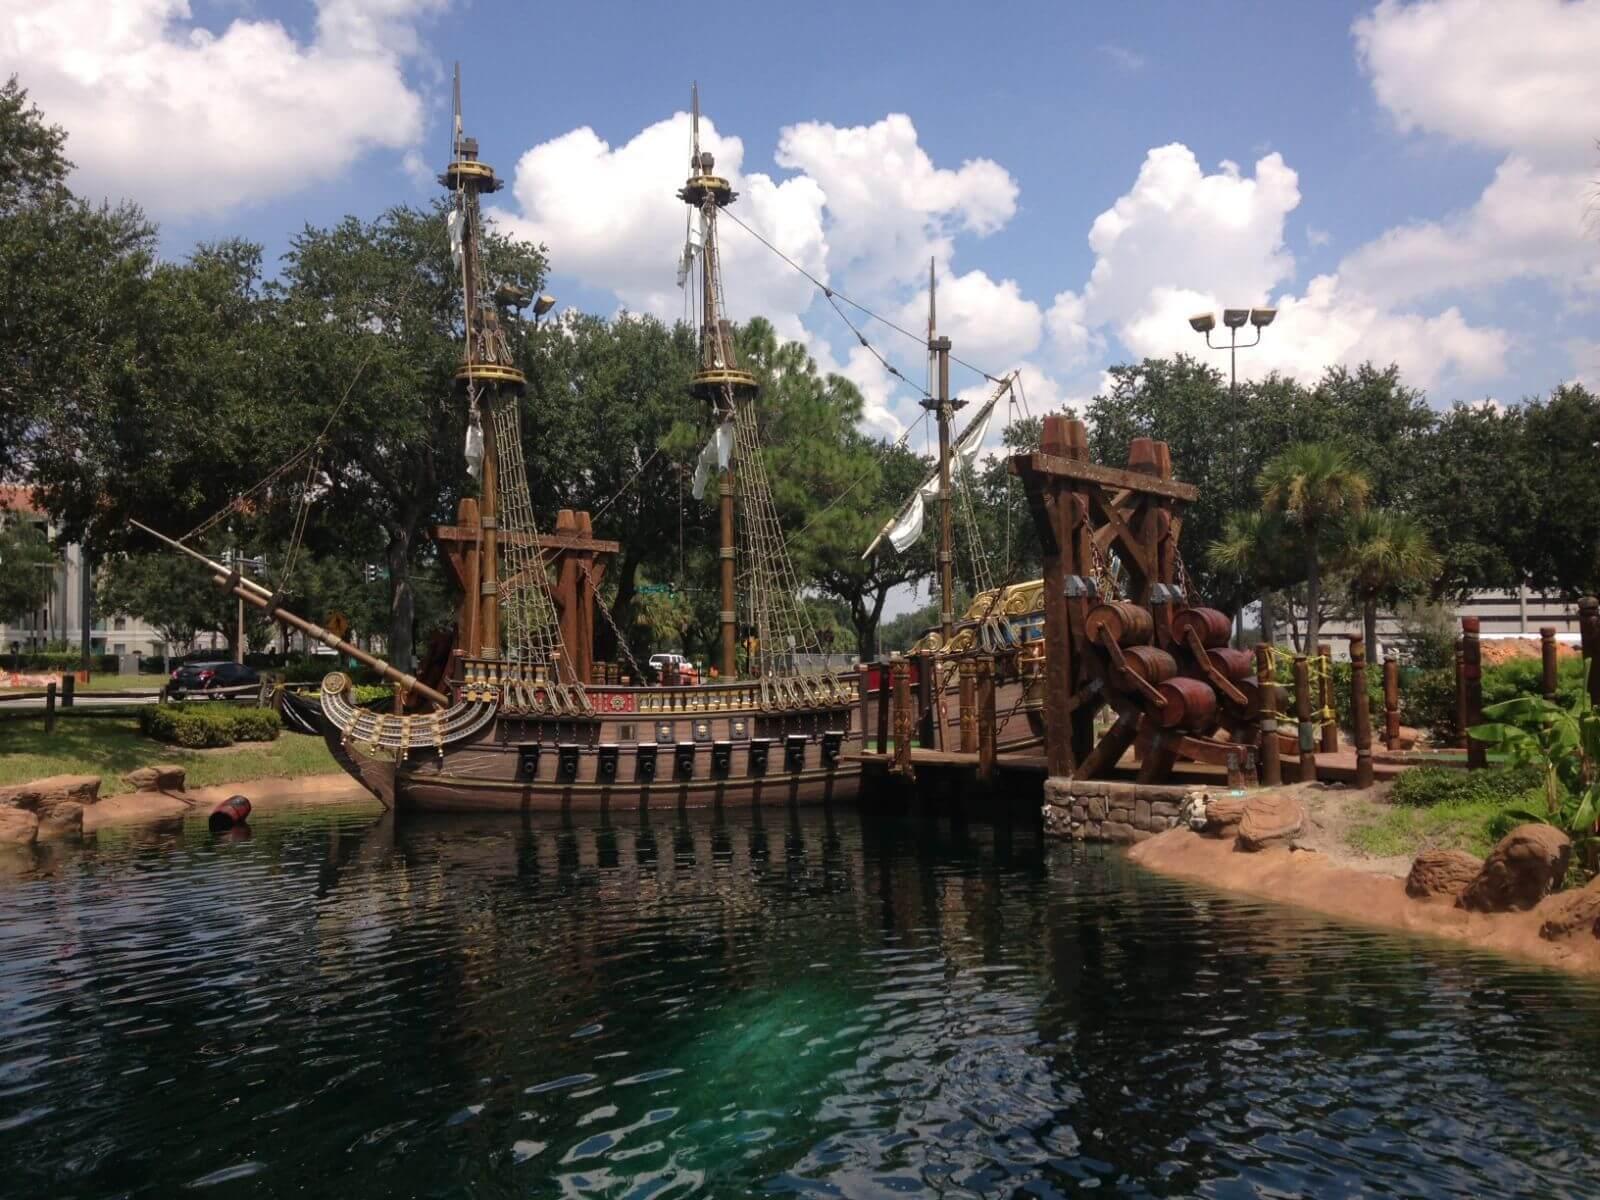 Pirate's Island Adventure Golf em Orlando: Pirate's Island Adventure Golf em Orlando: Pirate's Cove Adventure Golf